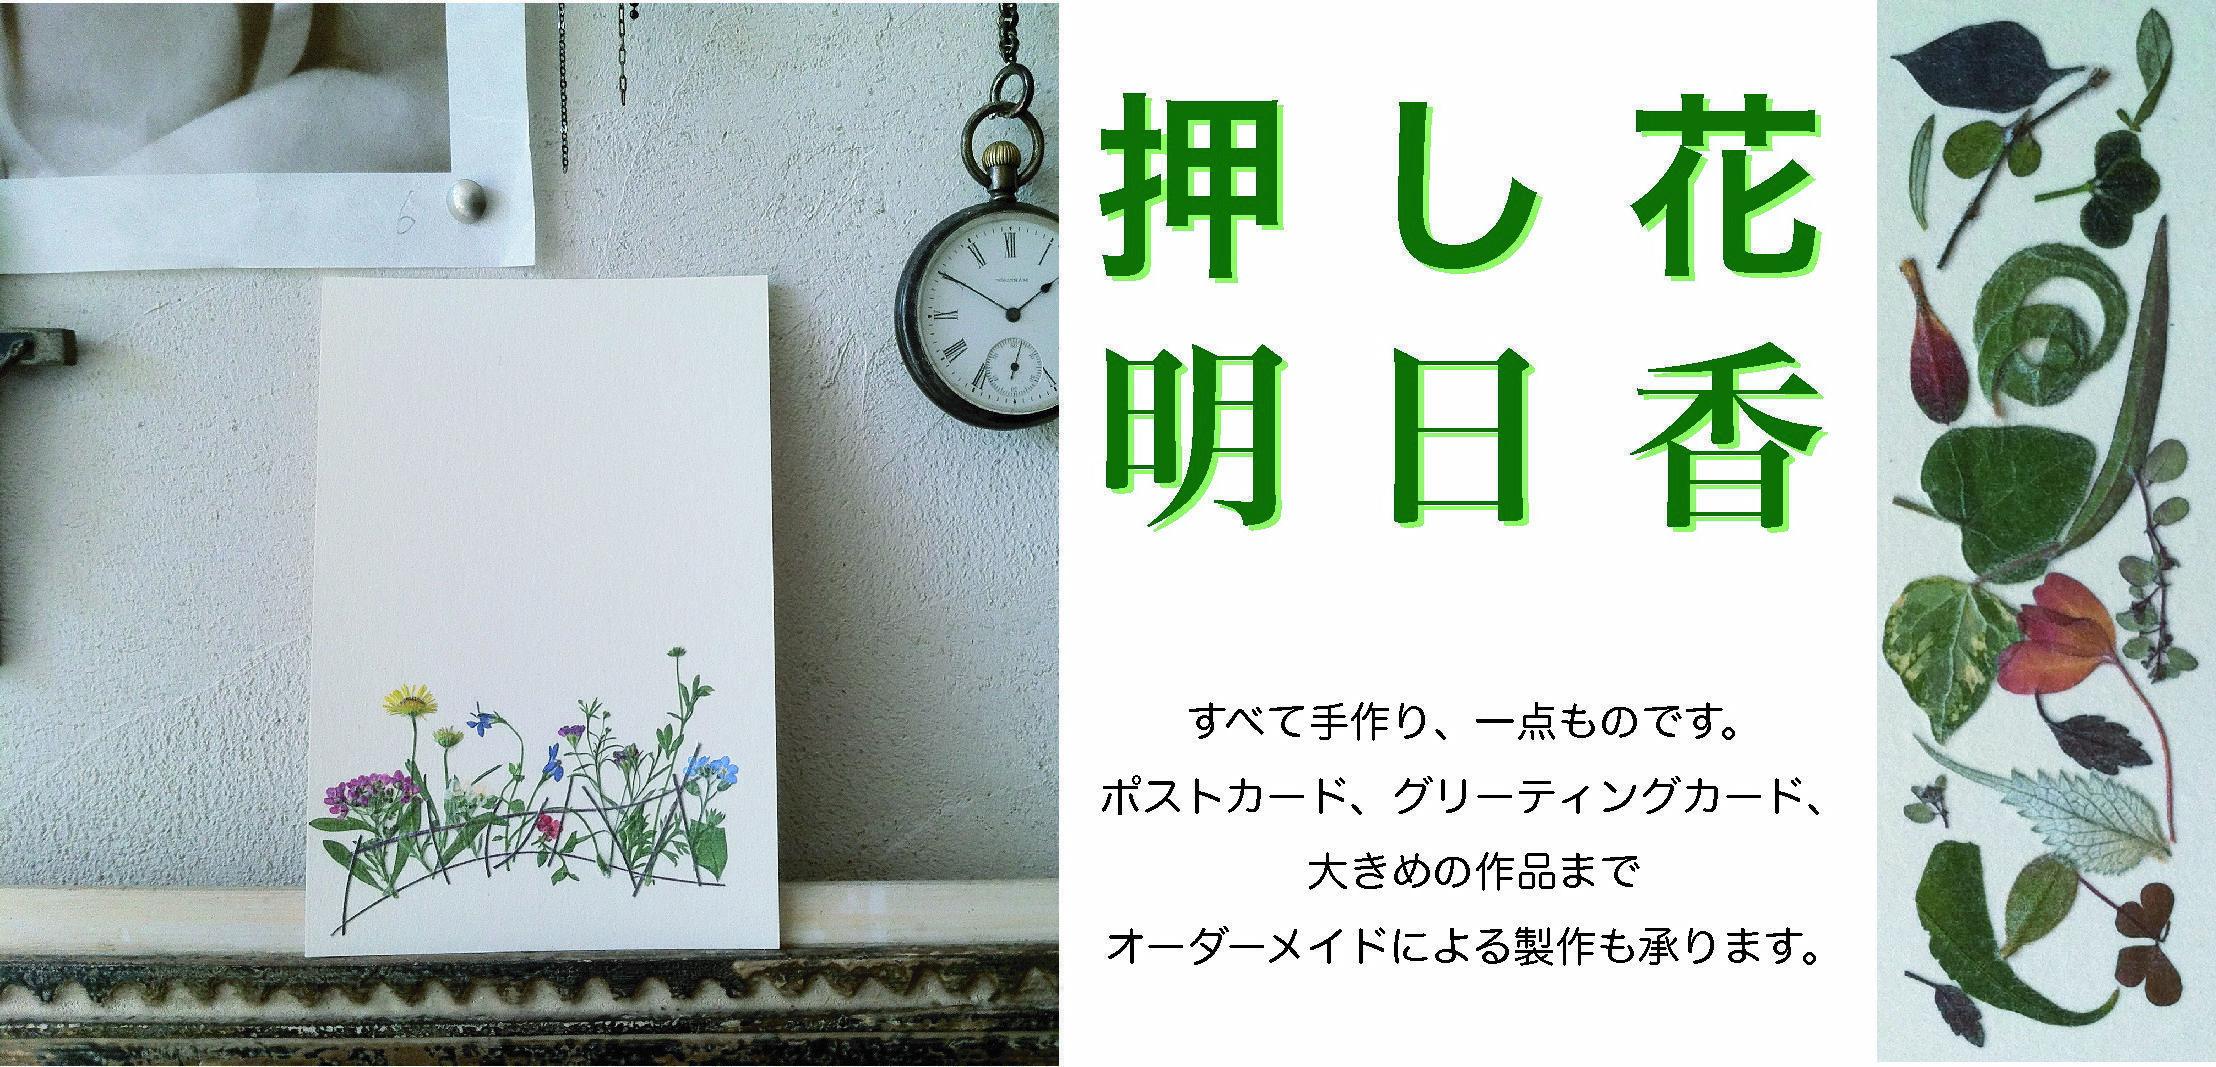 押し花明日香/布施陽子(押し花作品製作販売)